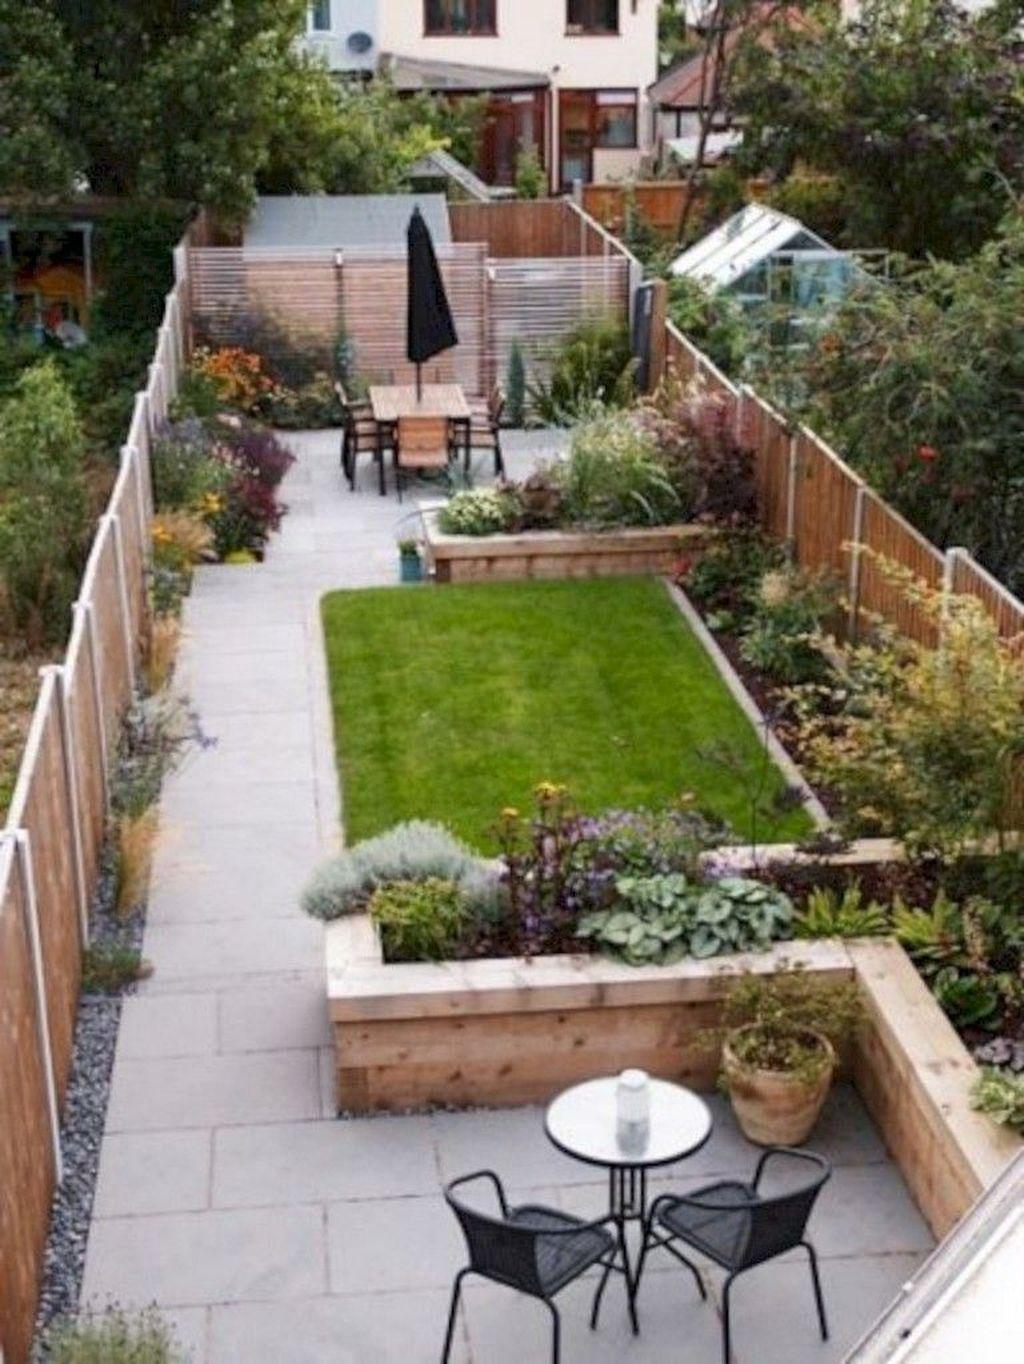 20 Minimalist Garden Design Ideas For Small Garden 20 Minimalist Garden Desig Garden Design Pictures Small Backyard Landscaping Garden Design Layout